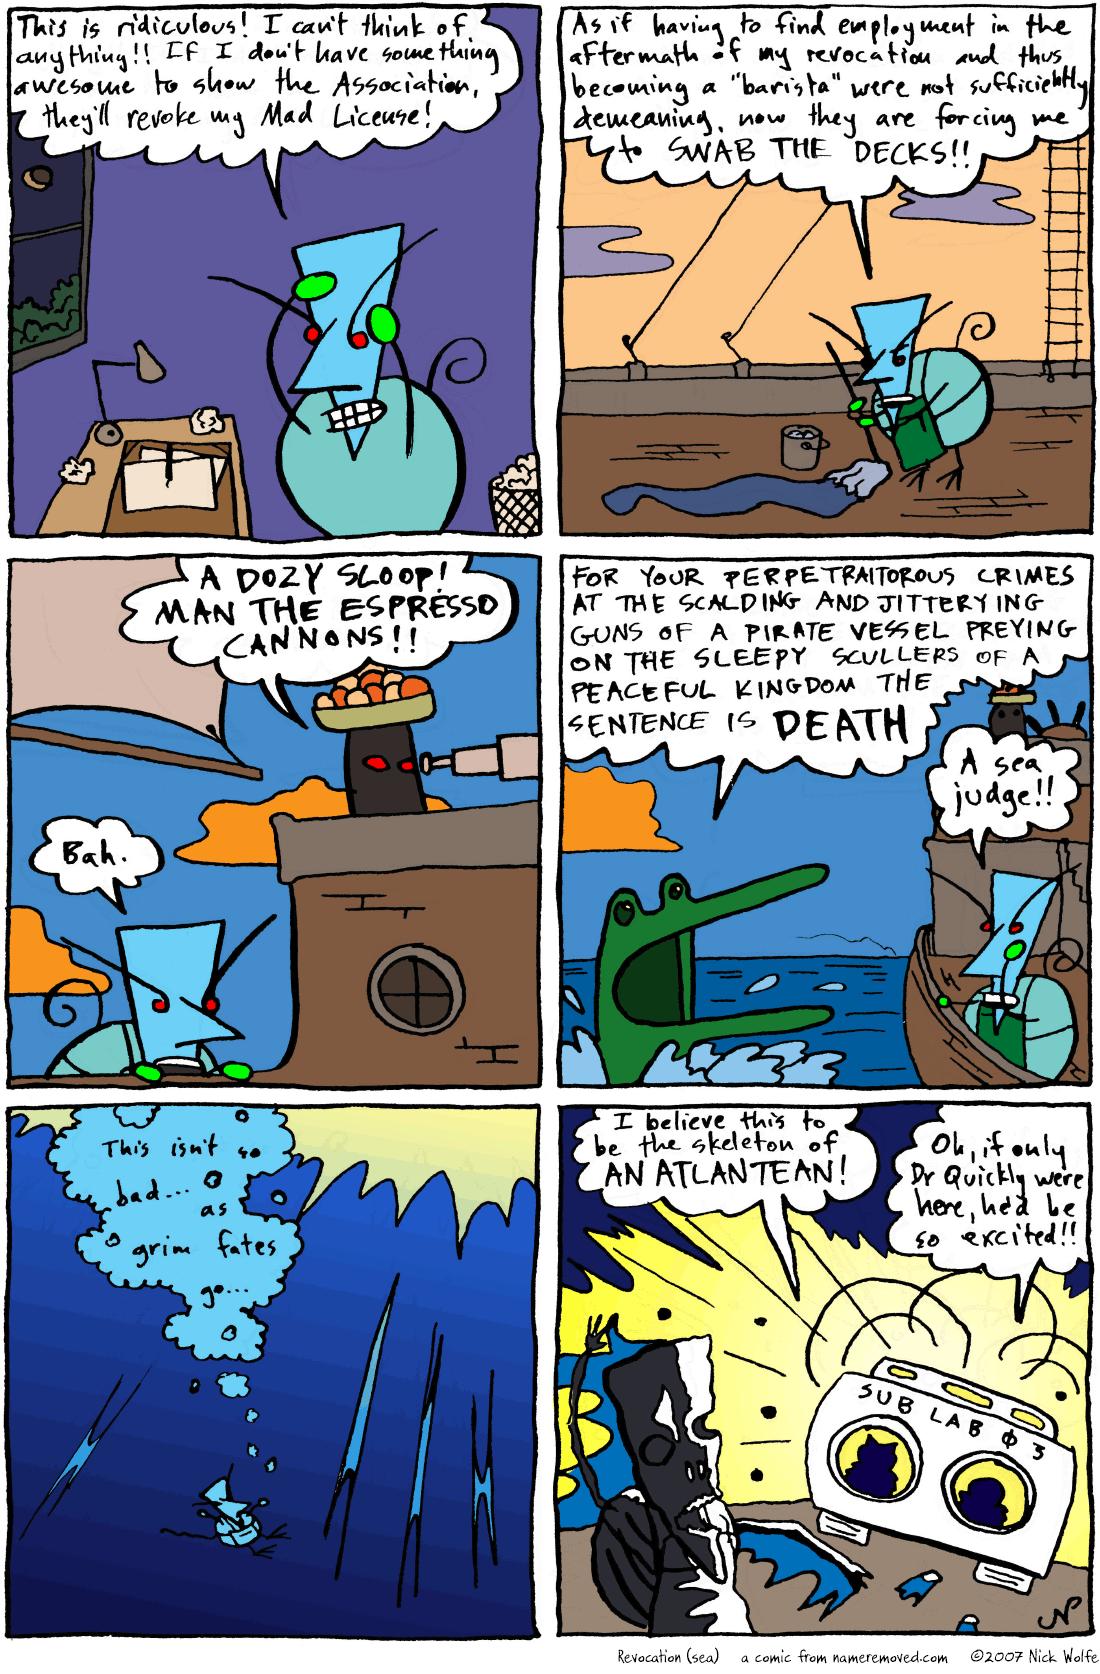 Revocation (sea)